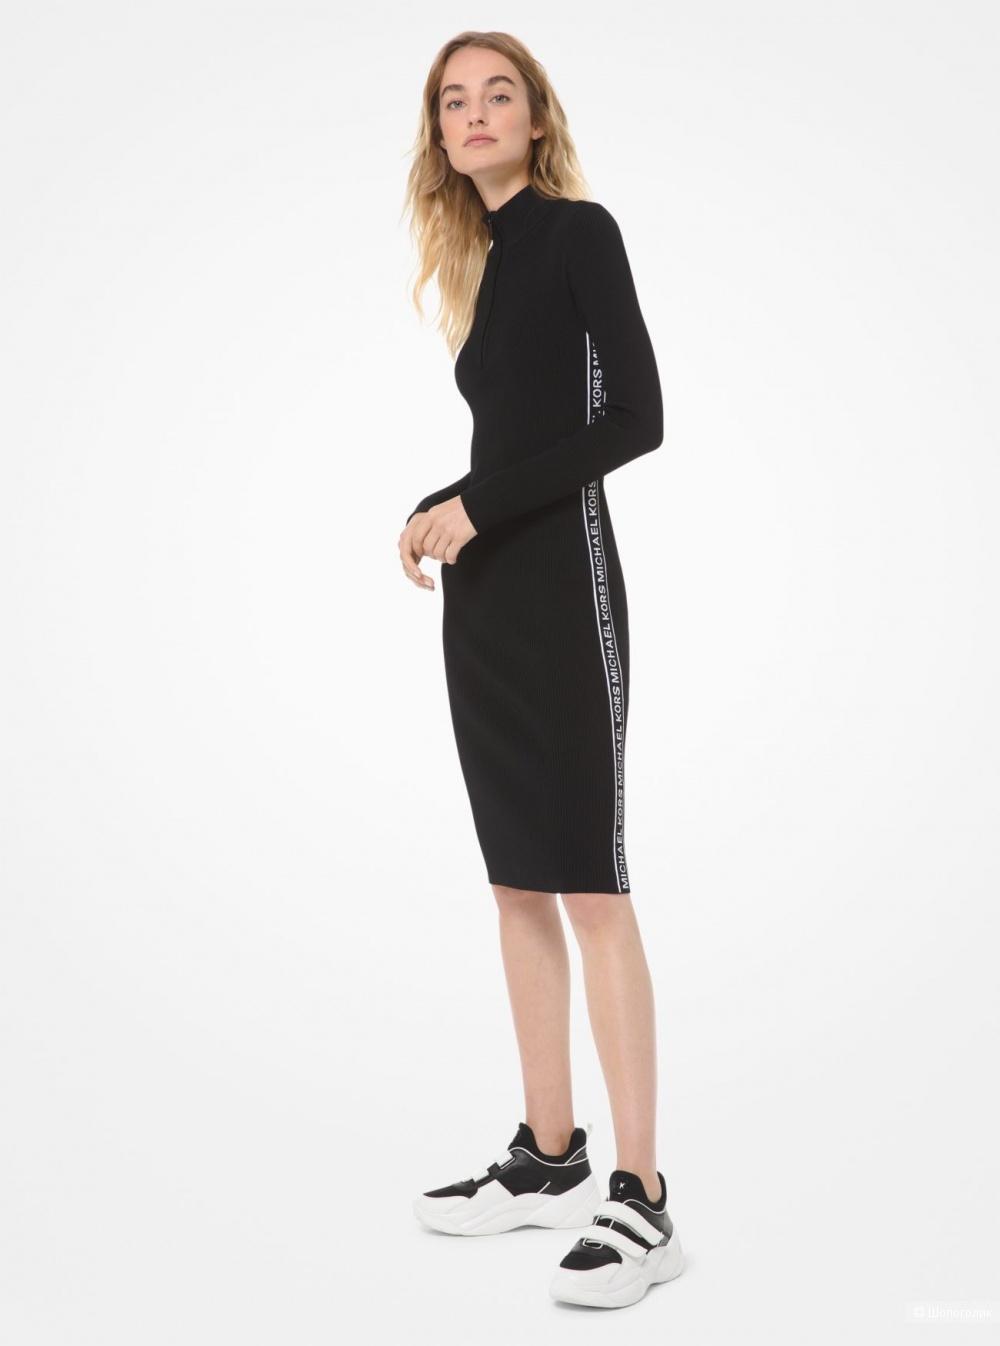 Платье Michael Kors размер XS (подойдёт на S)